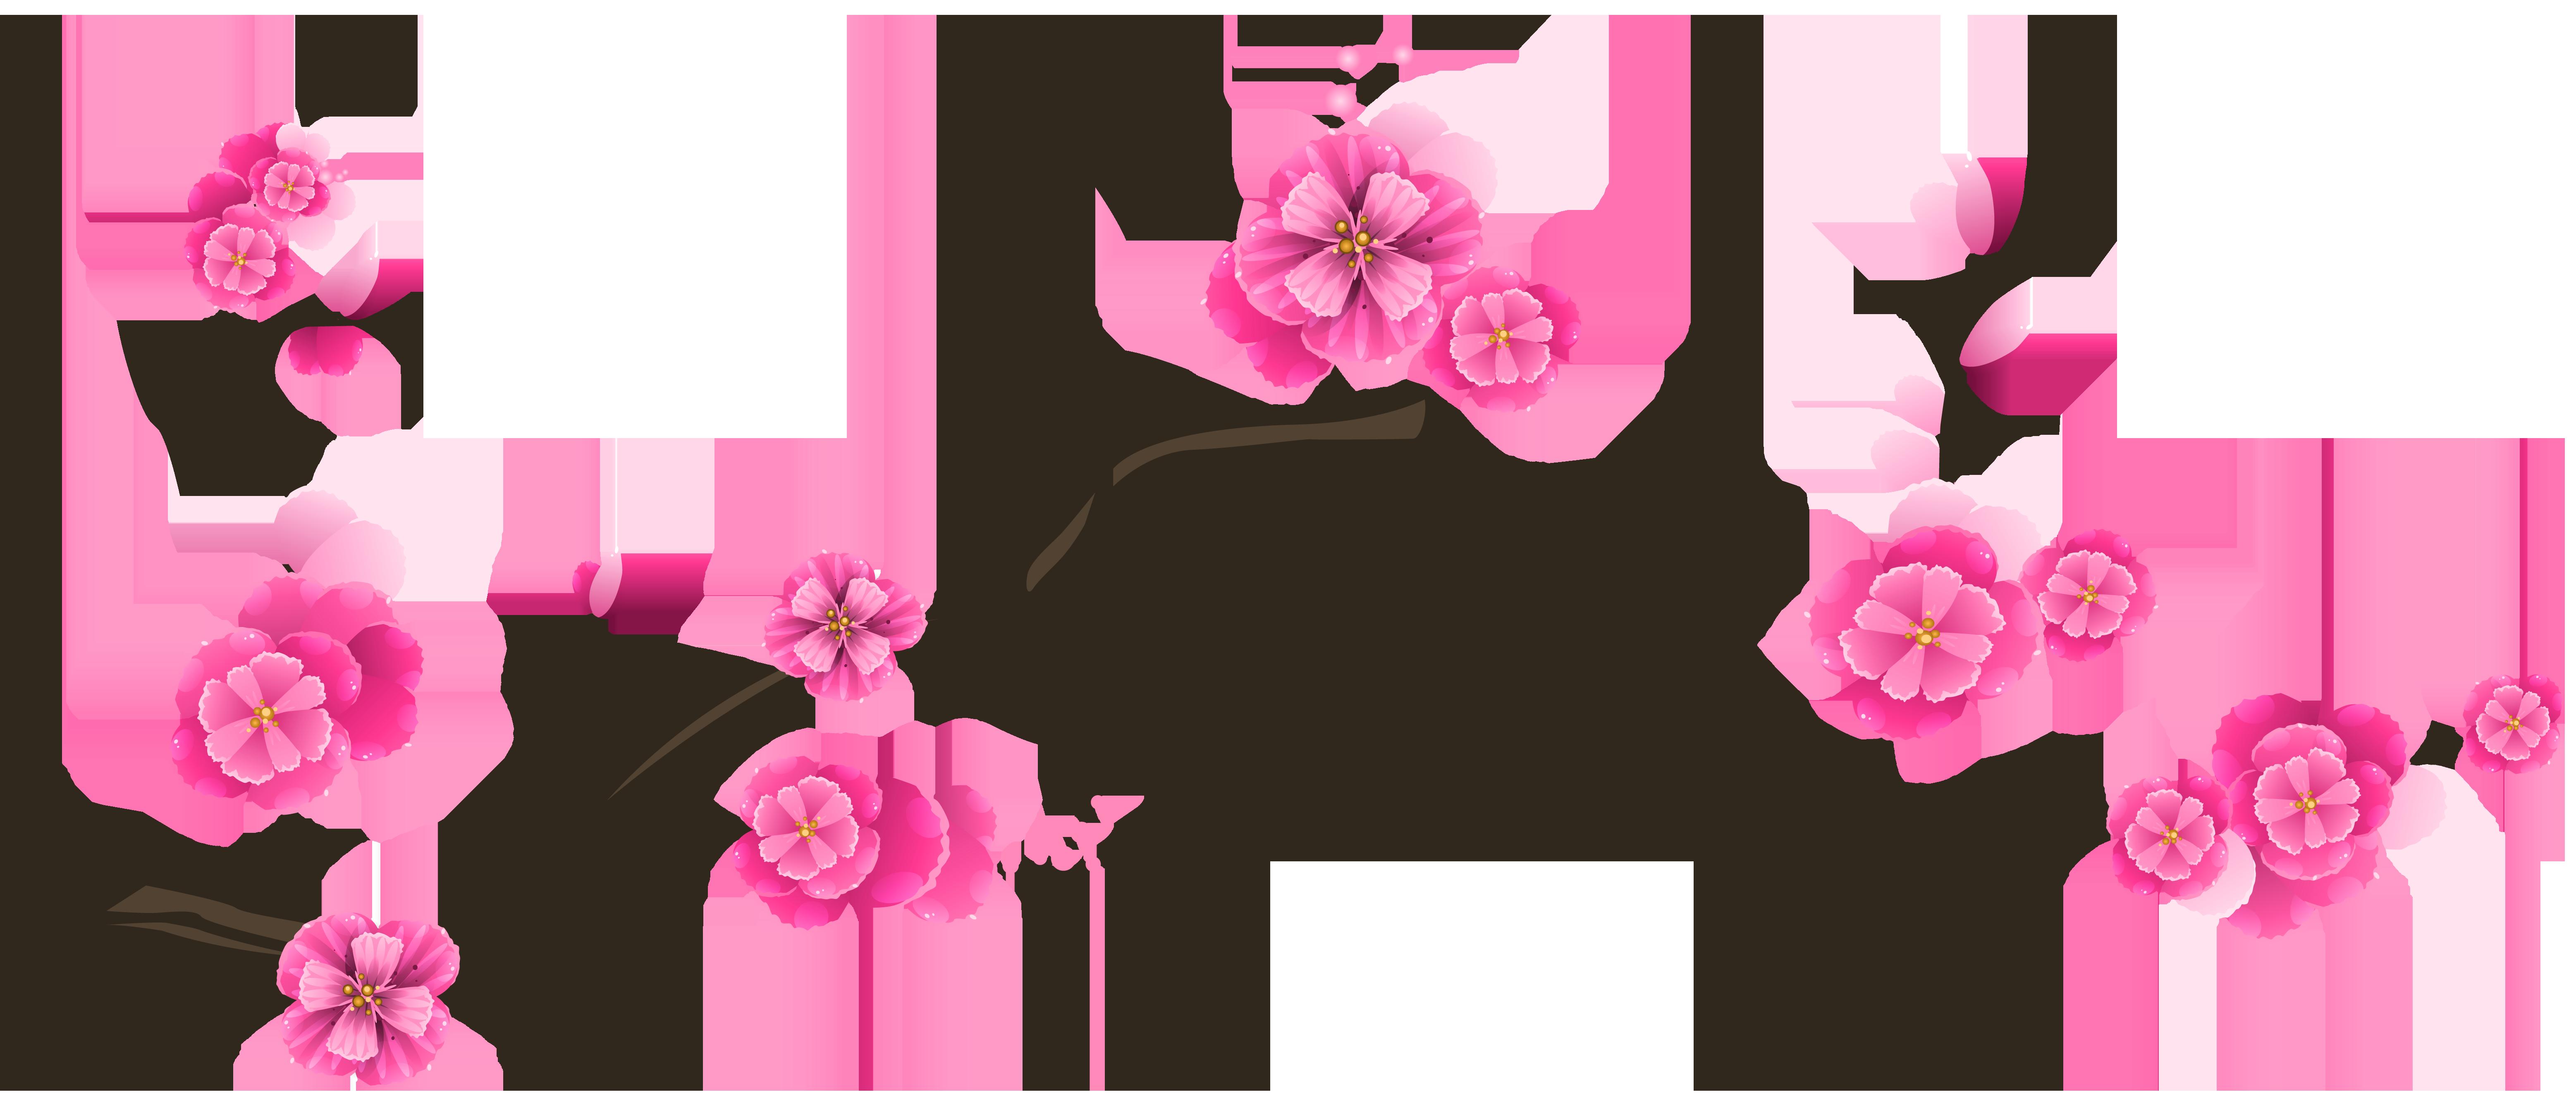 6230x2705 Sakura Branch Transparent Clip Art Imageu200b Gallery Yopriceville